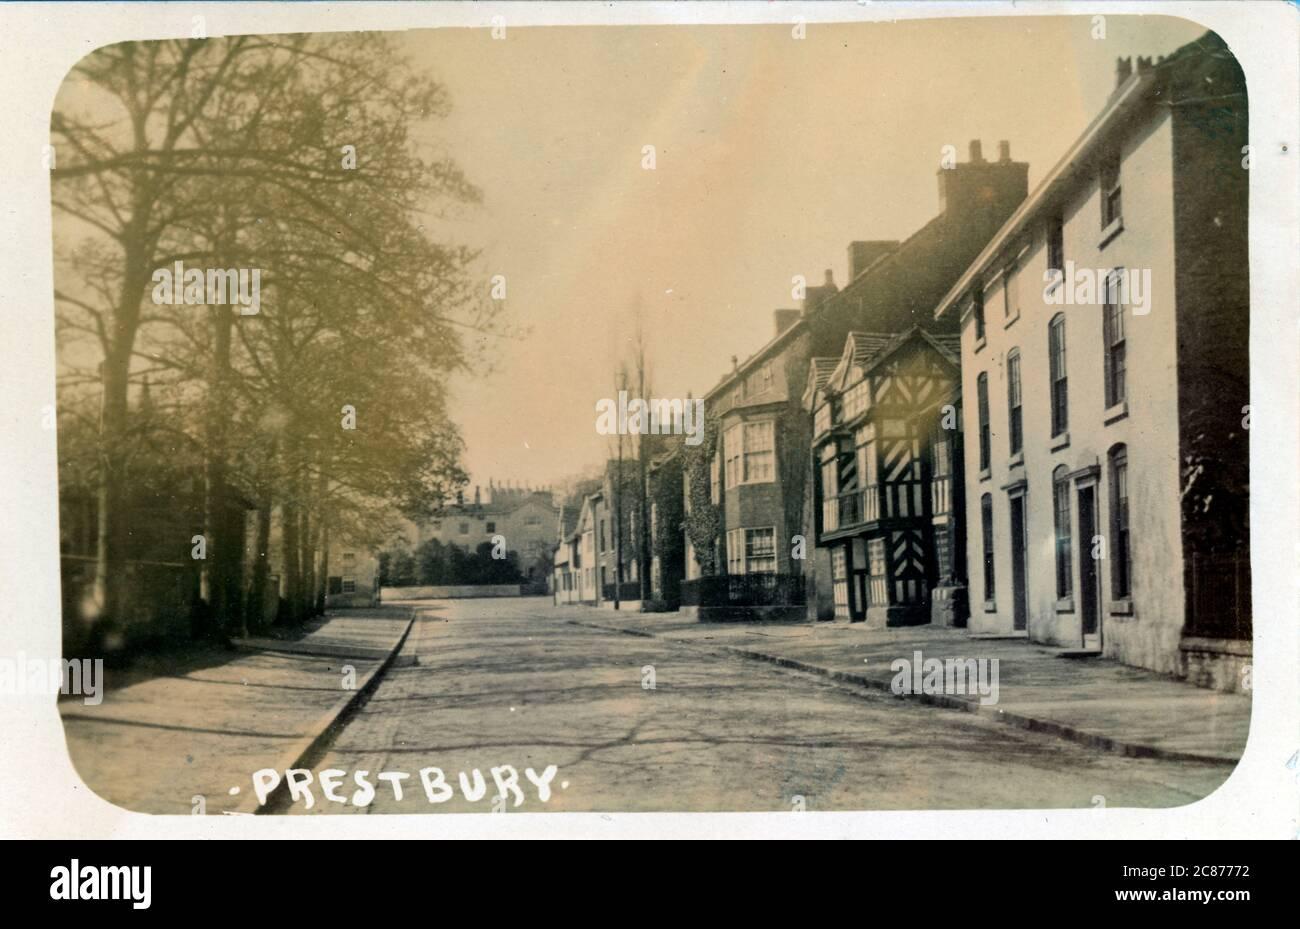 The Village, Prestbury, Macclesfield, Cheshire, Inghilterra. Foto Stock